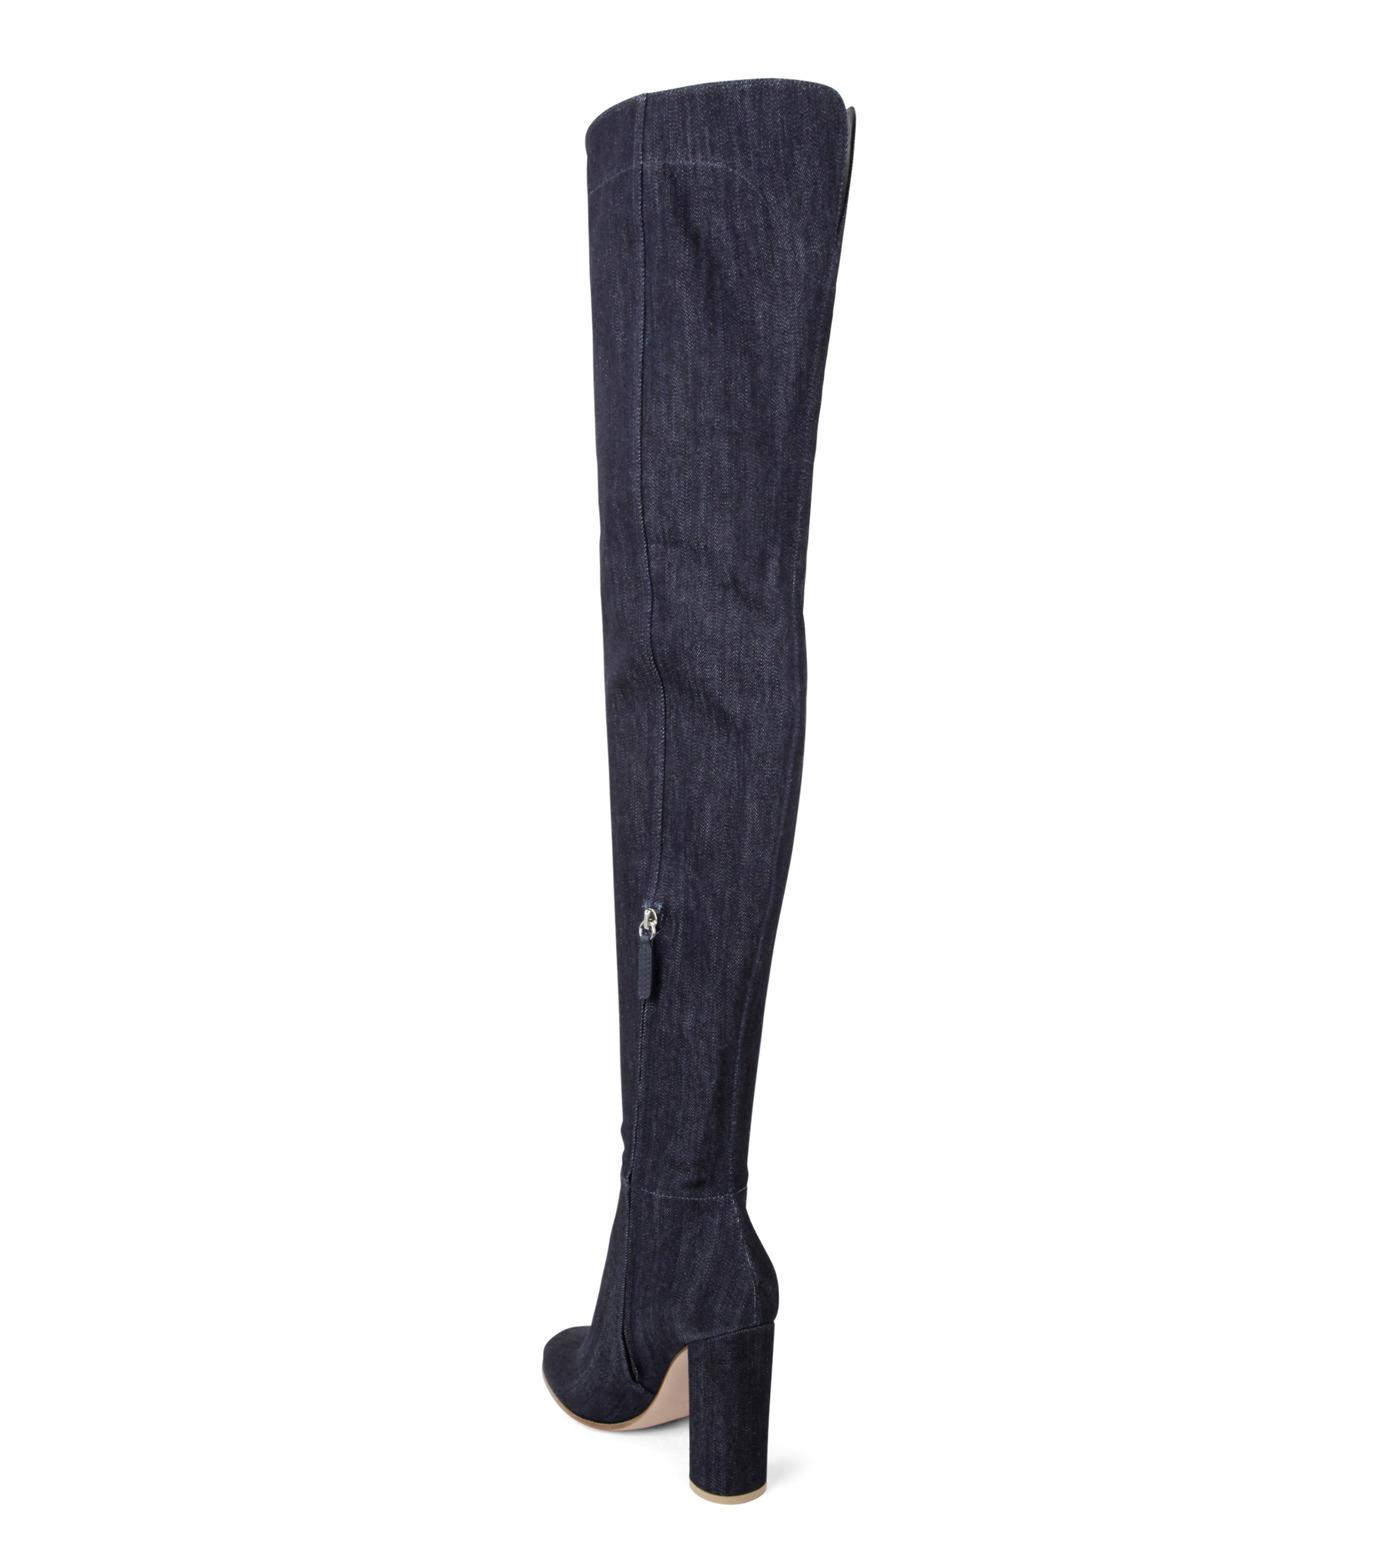 Gianvito Rossi(ジャンヴィト ロッシ)のDenim Over the Knee Boots-INDIGO(ブーツ/boots)-G80806-94 拡大詳細画像2